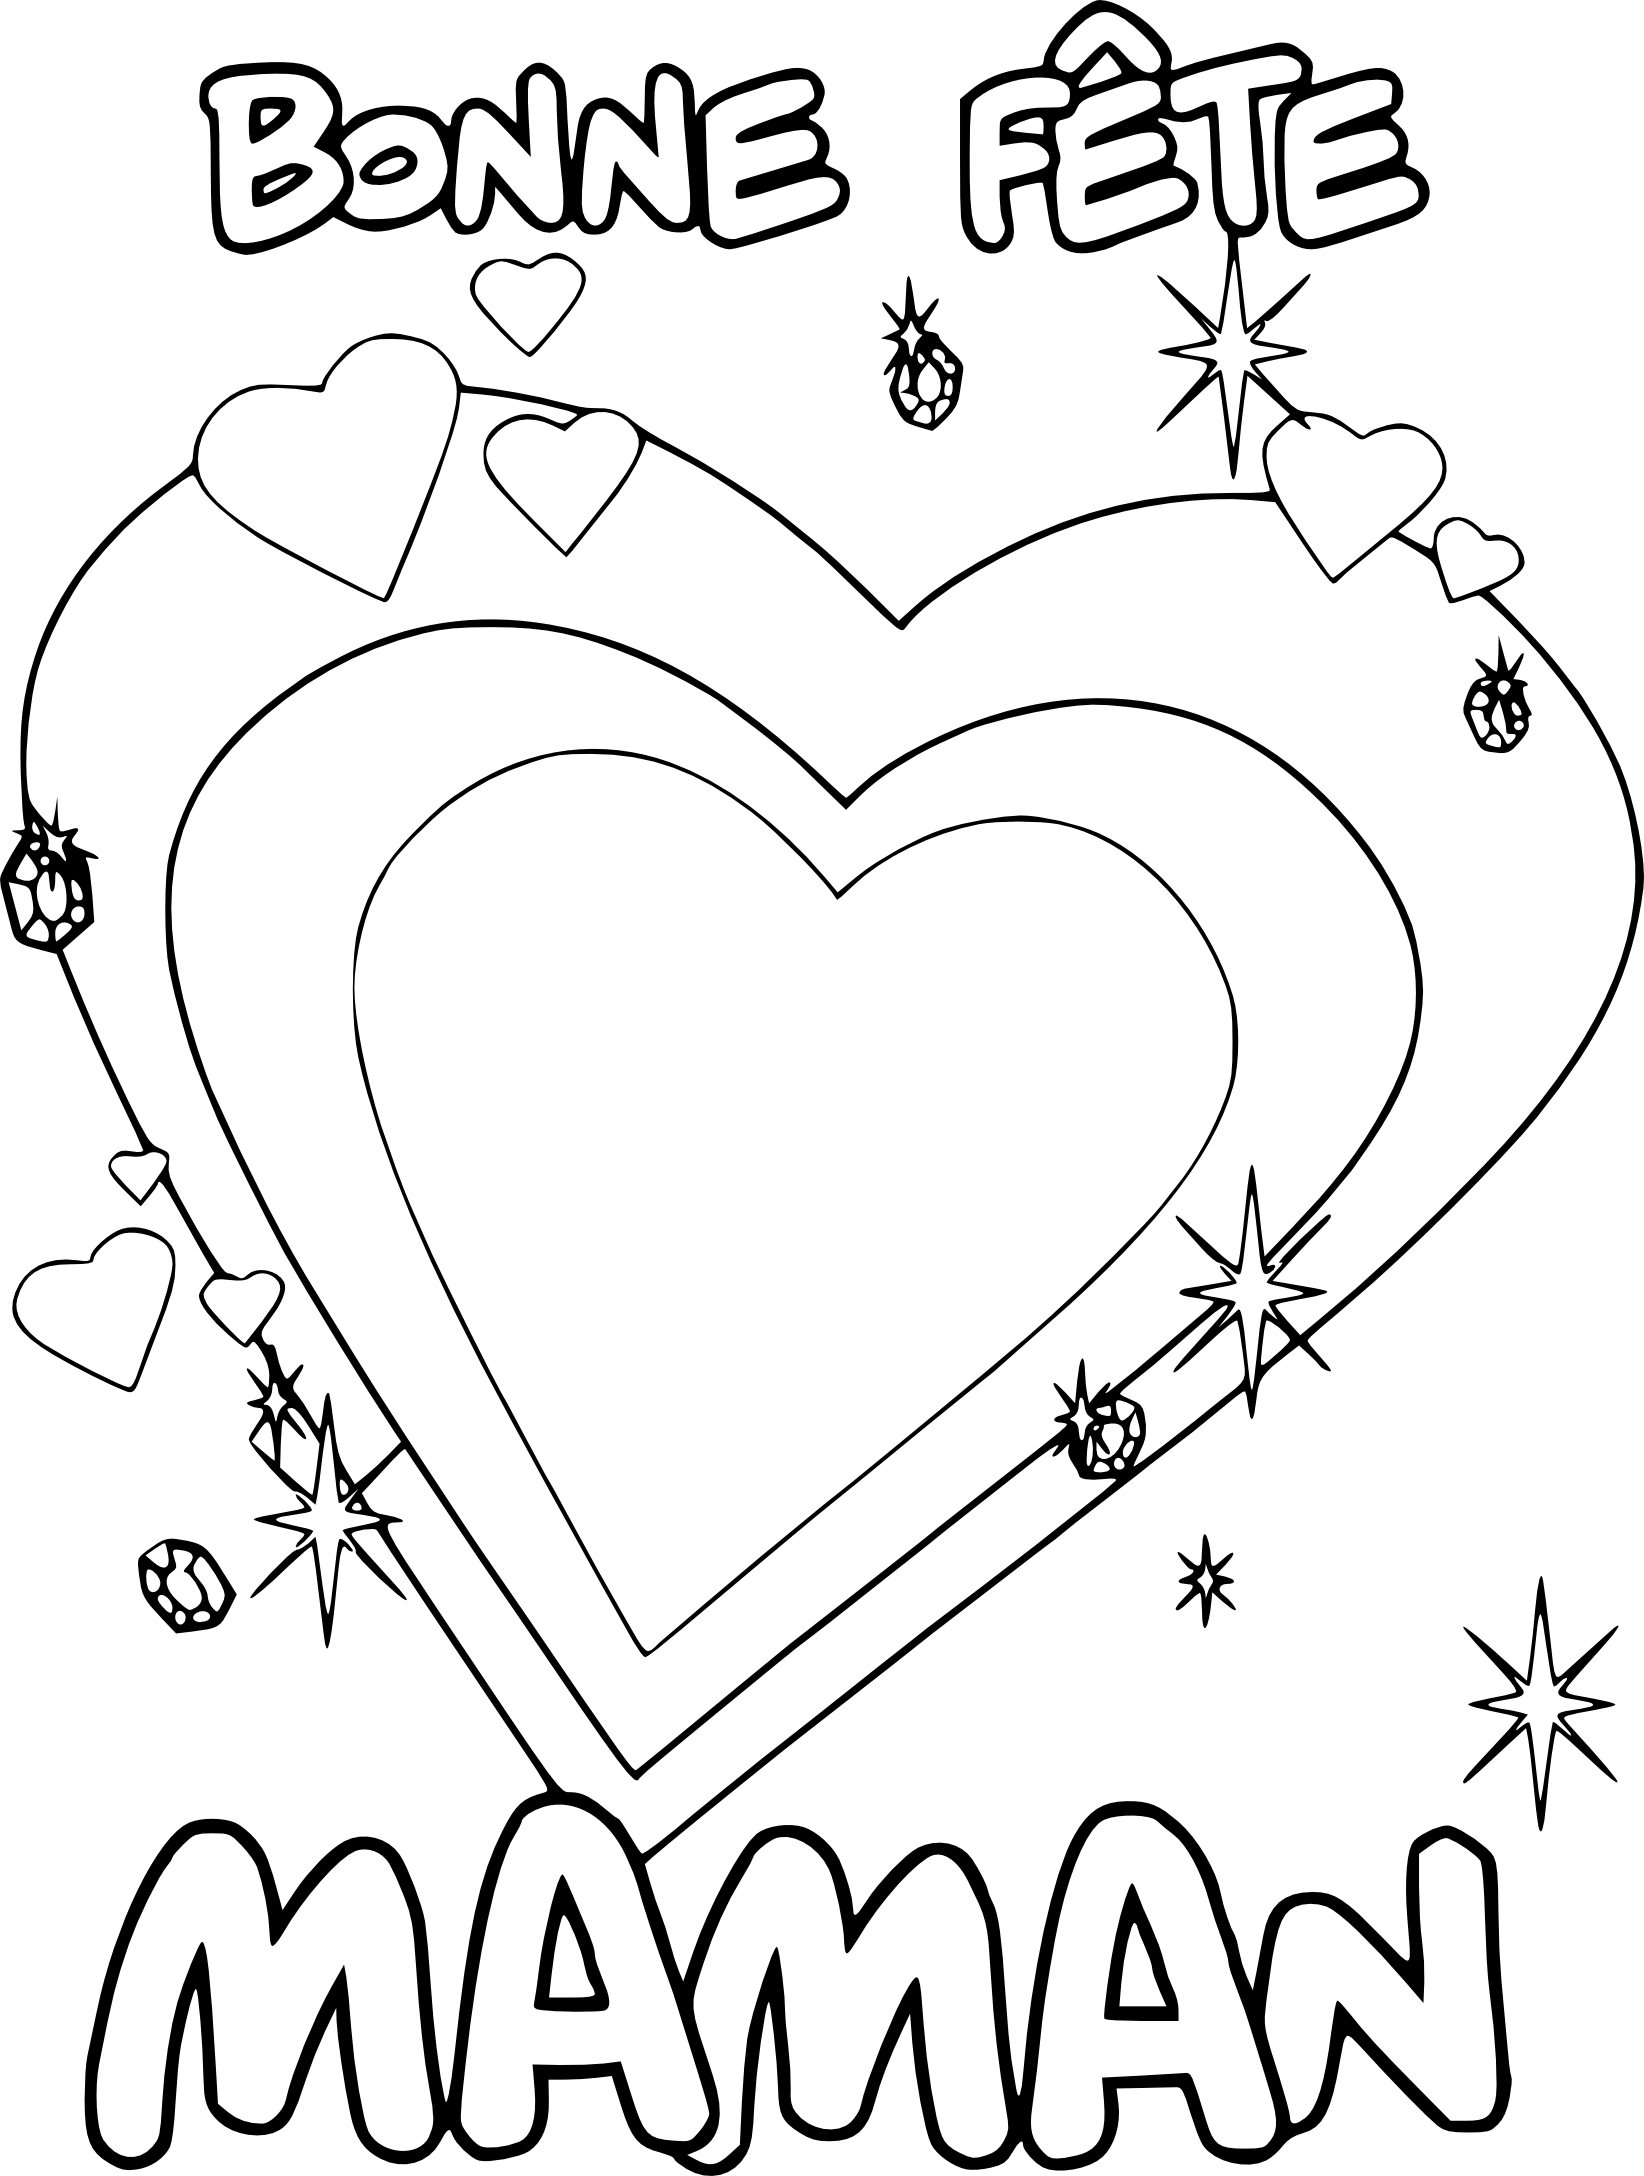 Coloriage fete des meres coeur